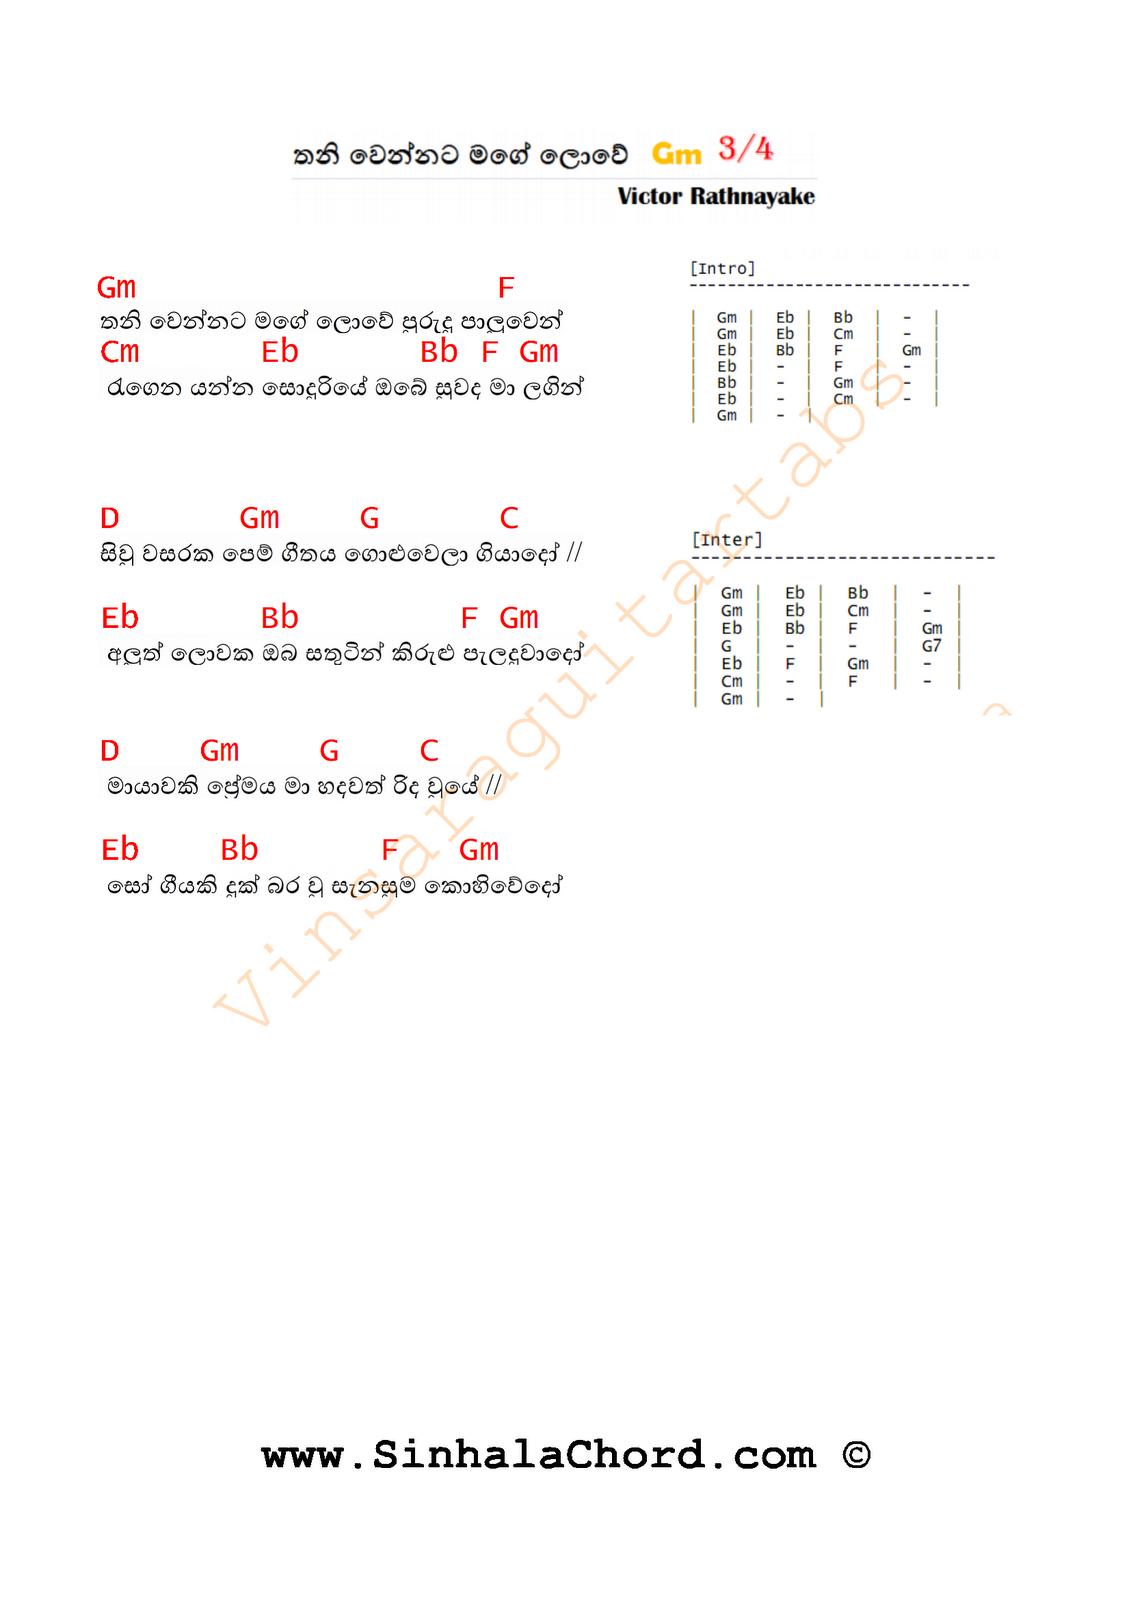 Thaniwennata Mage Lowe Guitar Chords : Sinhala Guitar Chords:Sinhala Songs Chords:Guitar Tabs ...